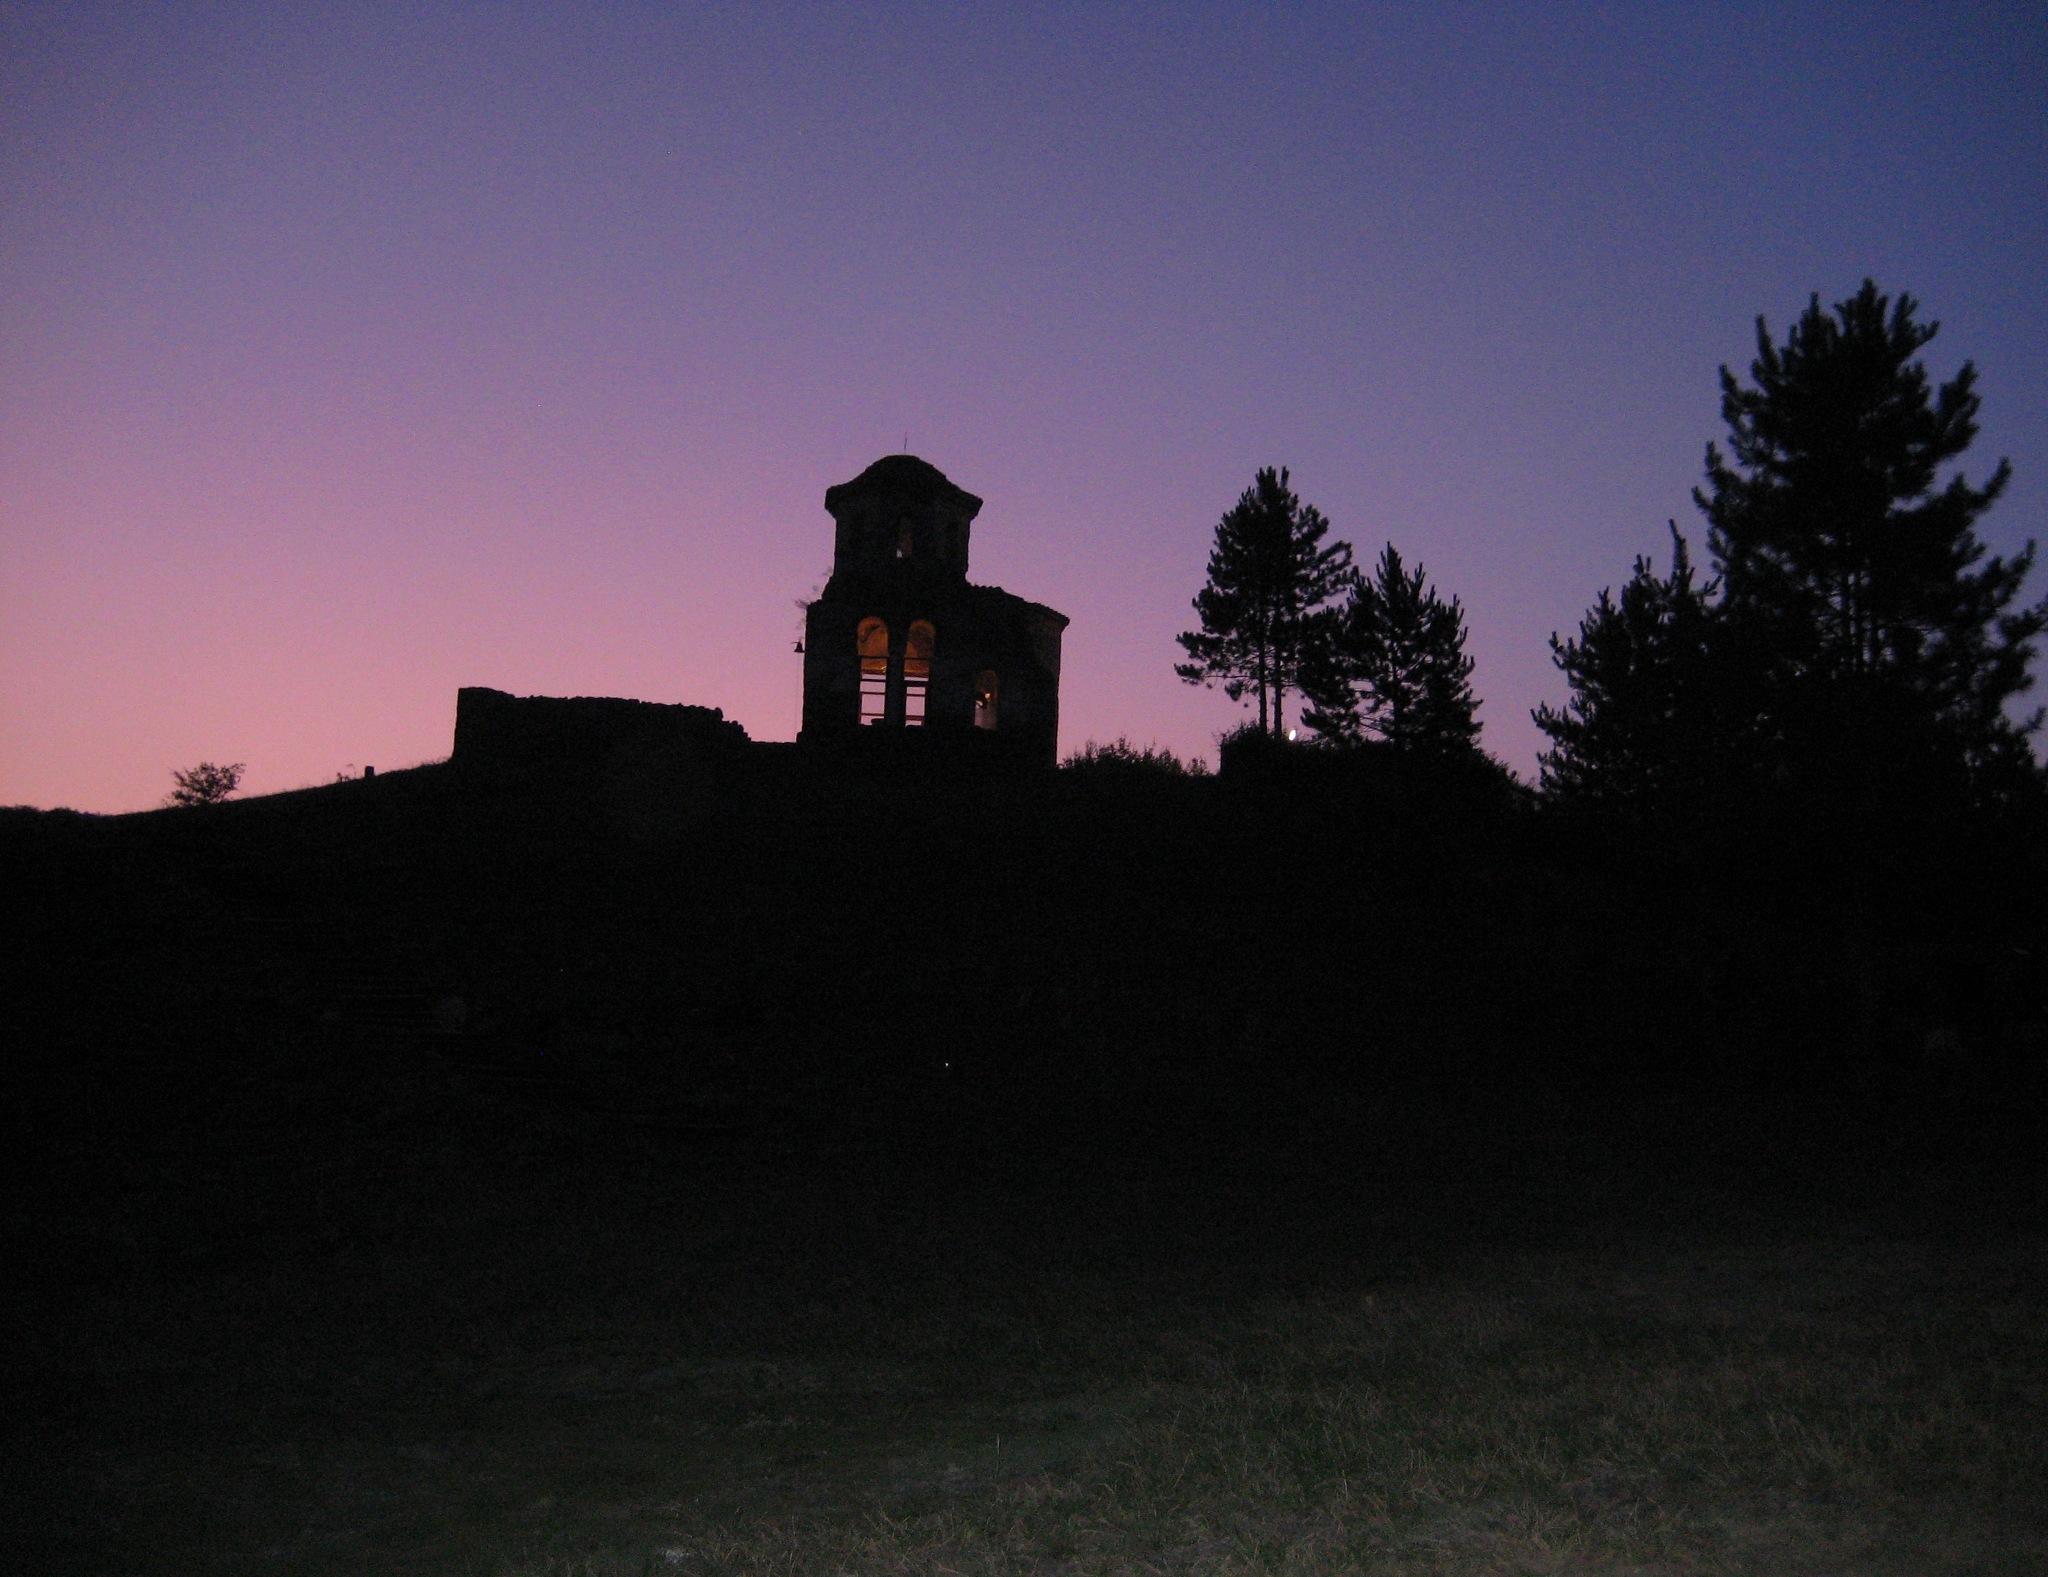 Manastir Pavlica by VeraMihajlovic